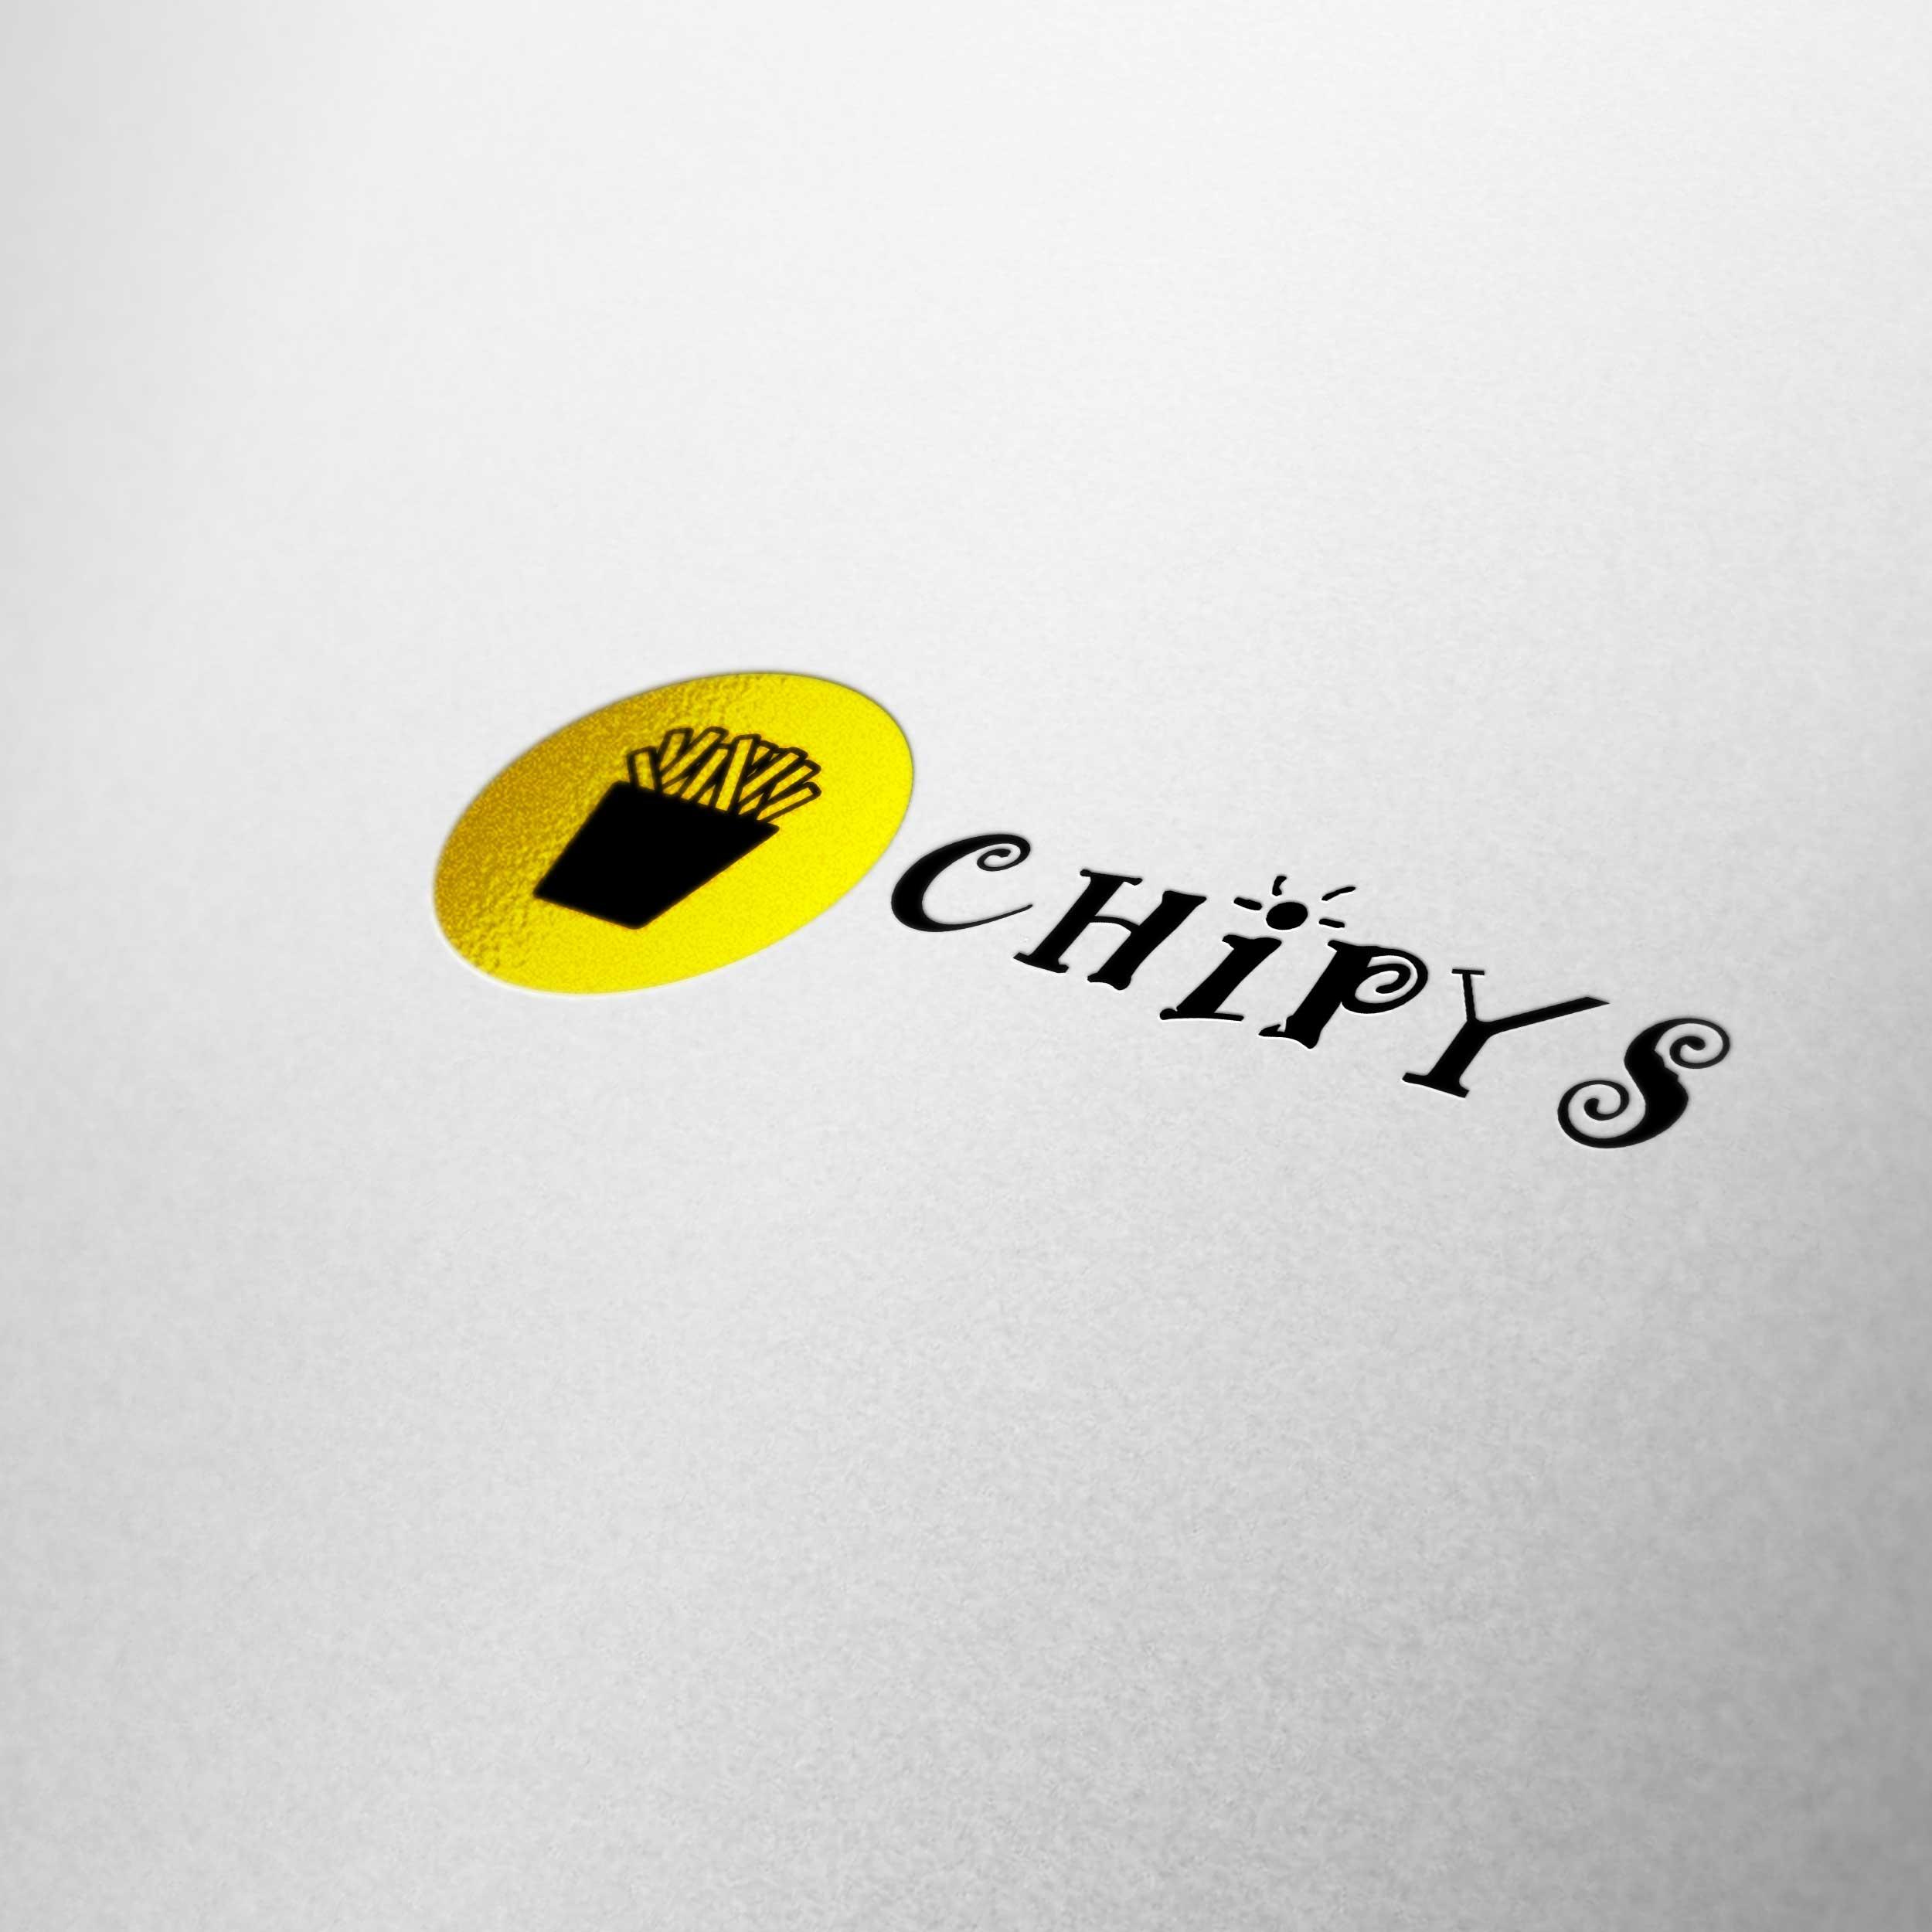 chippys-4-min